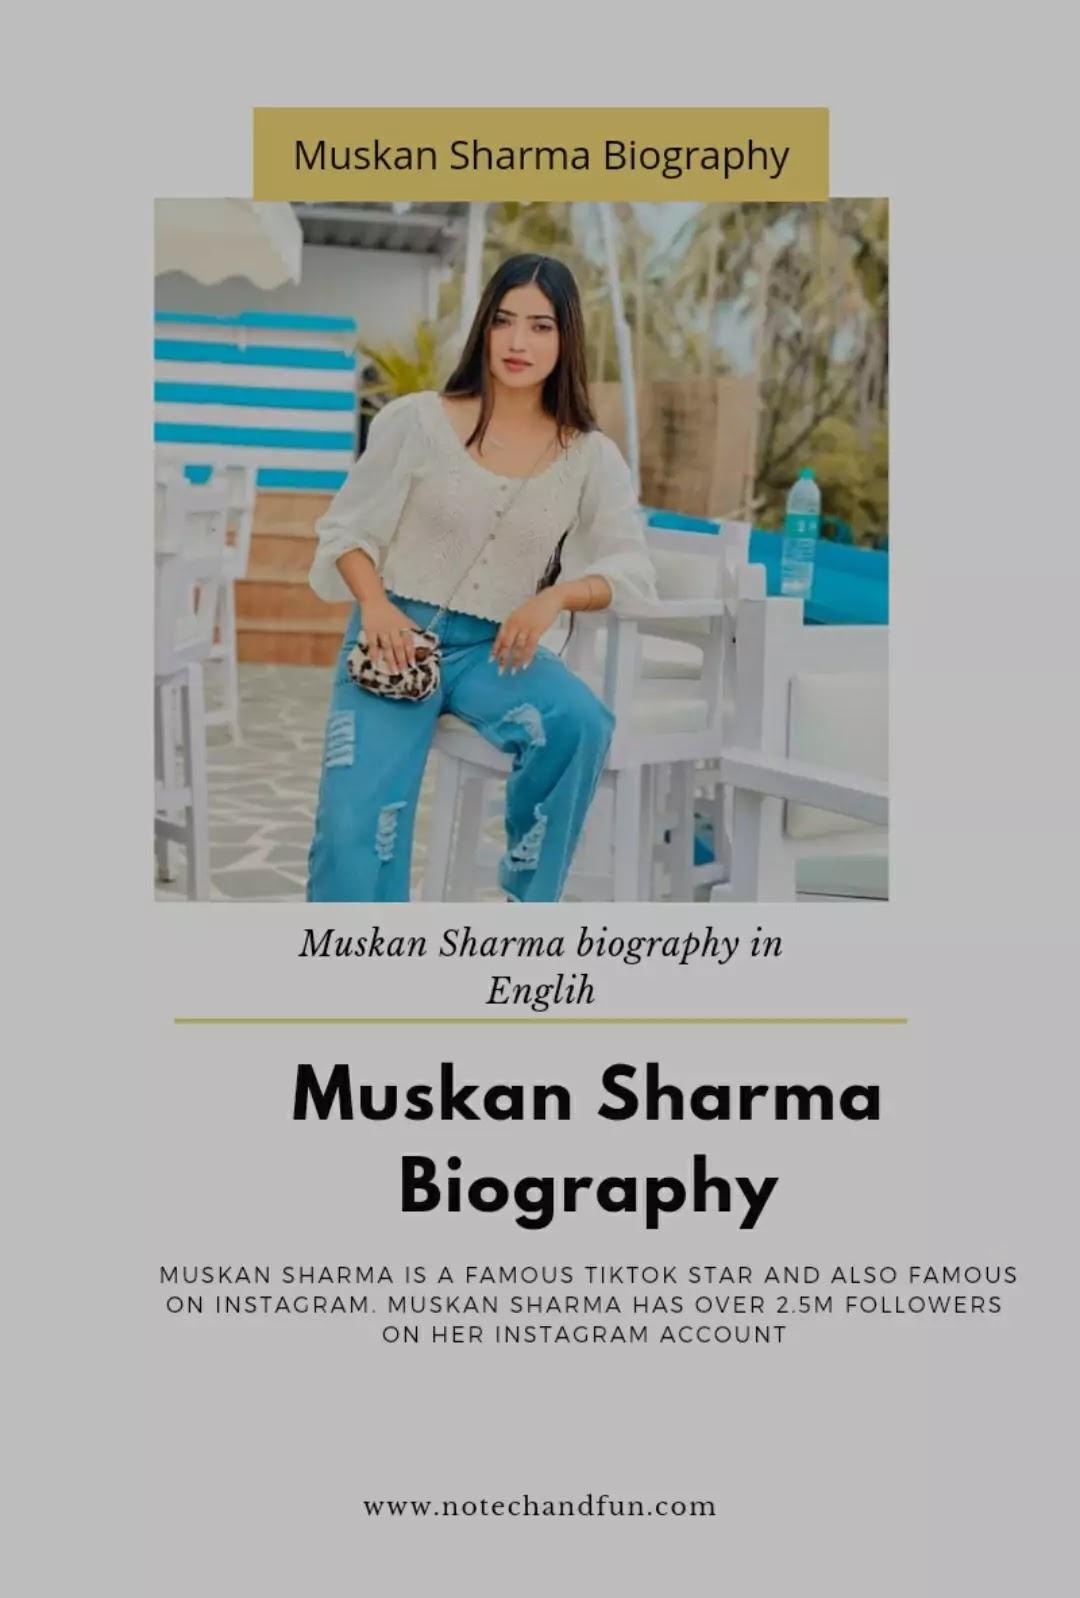 Muskan Sharma Biography